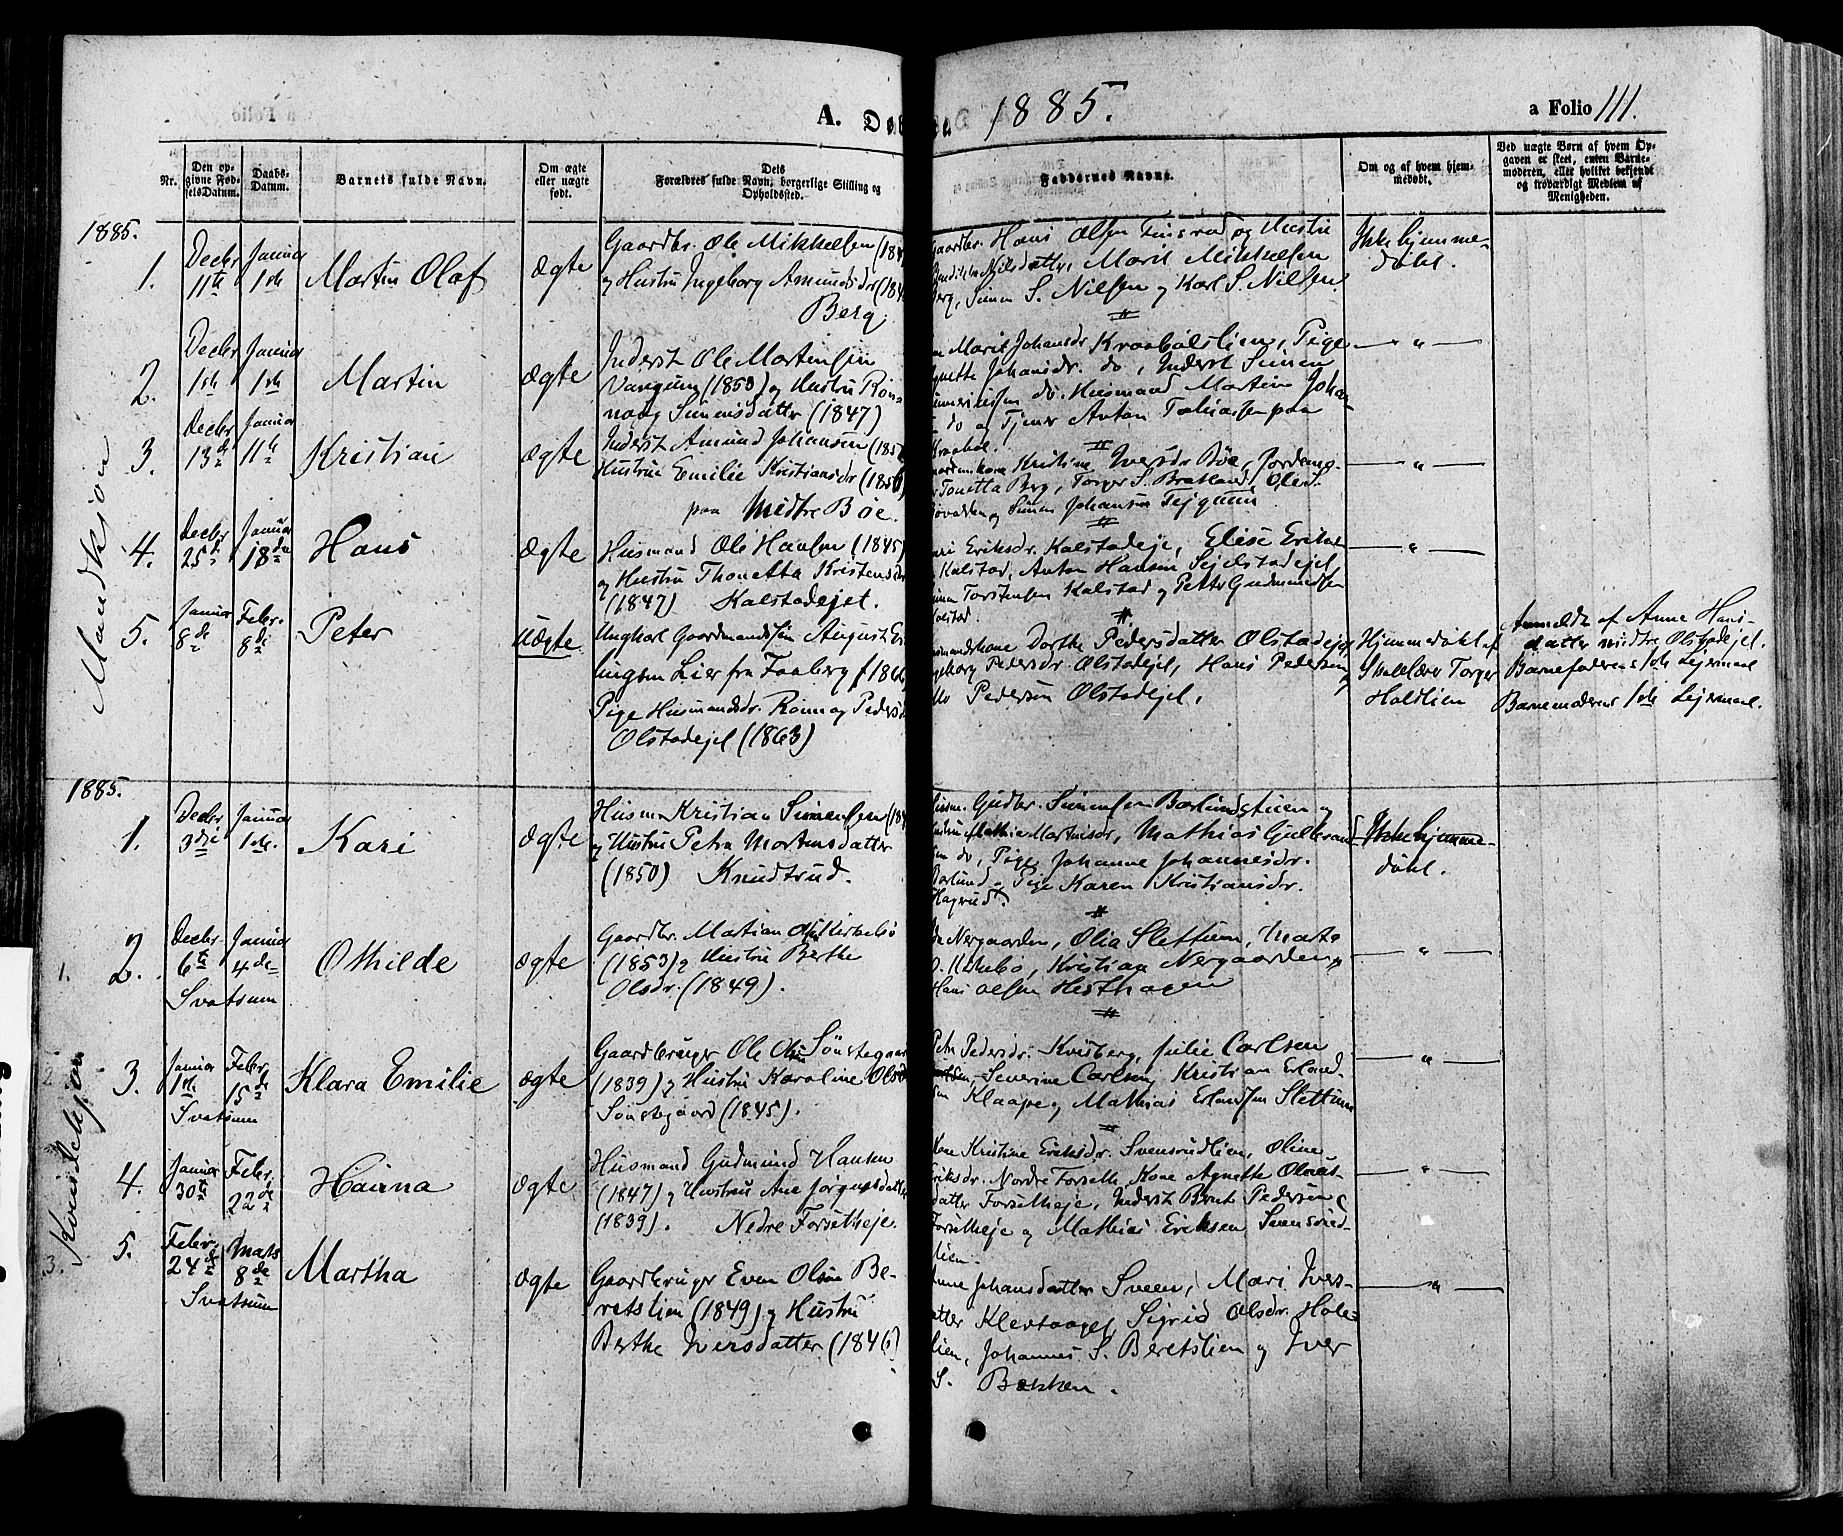 SAH, Gausdal prestekontor, Ministerialbok nr. 10, 1867-1886, s. 111